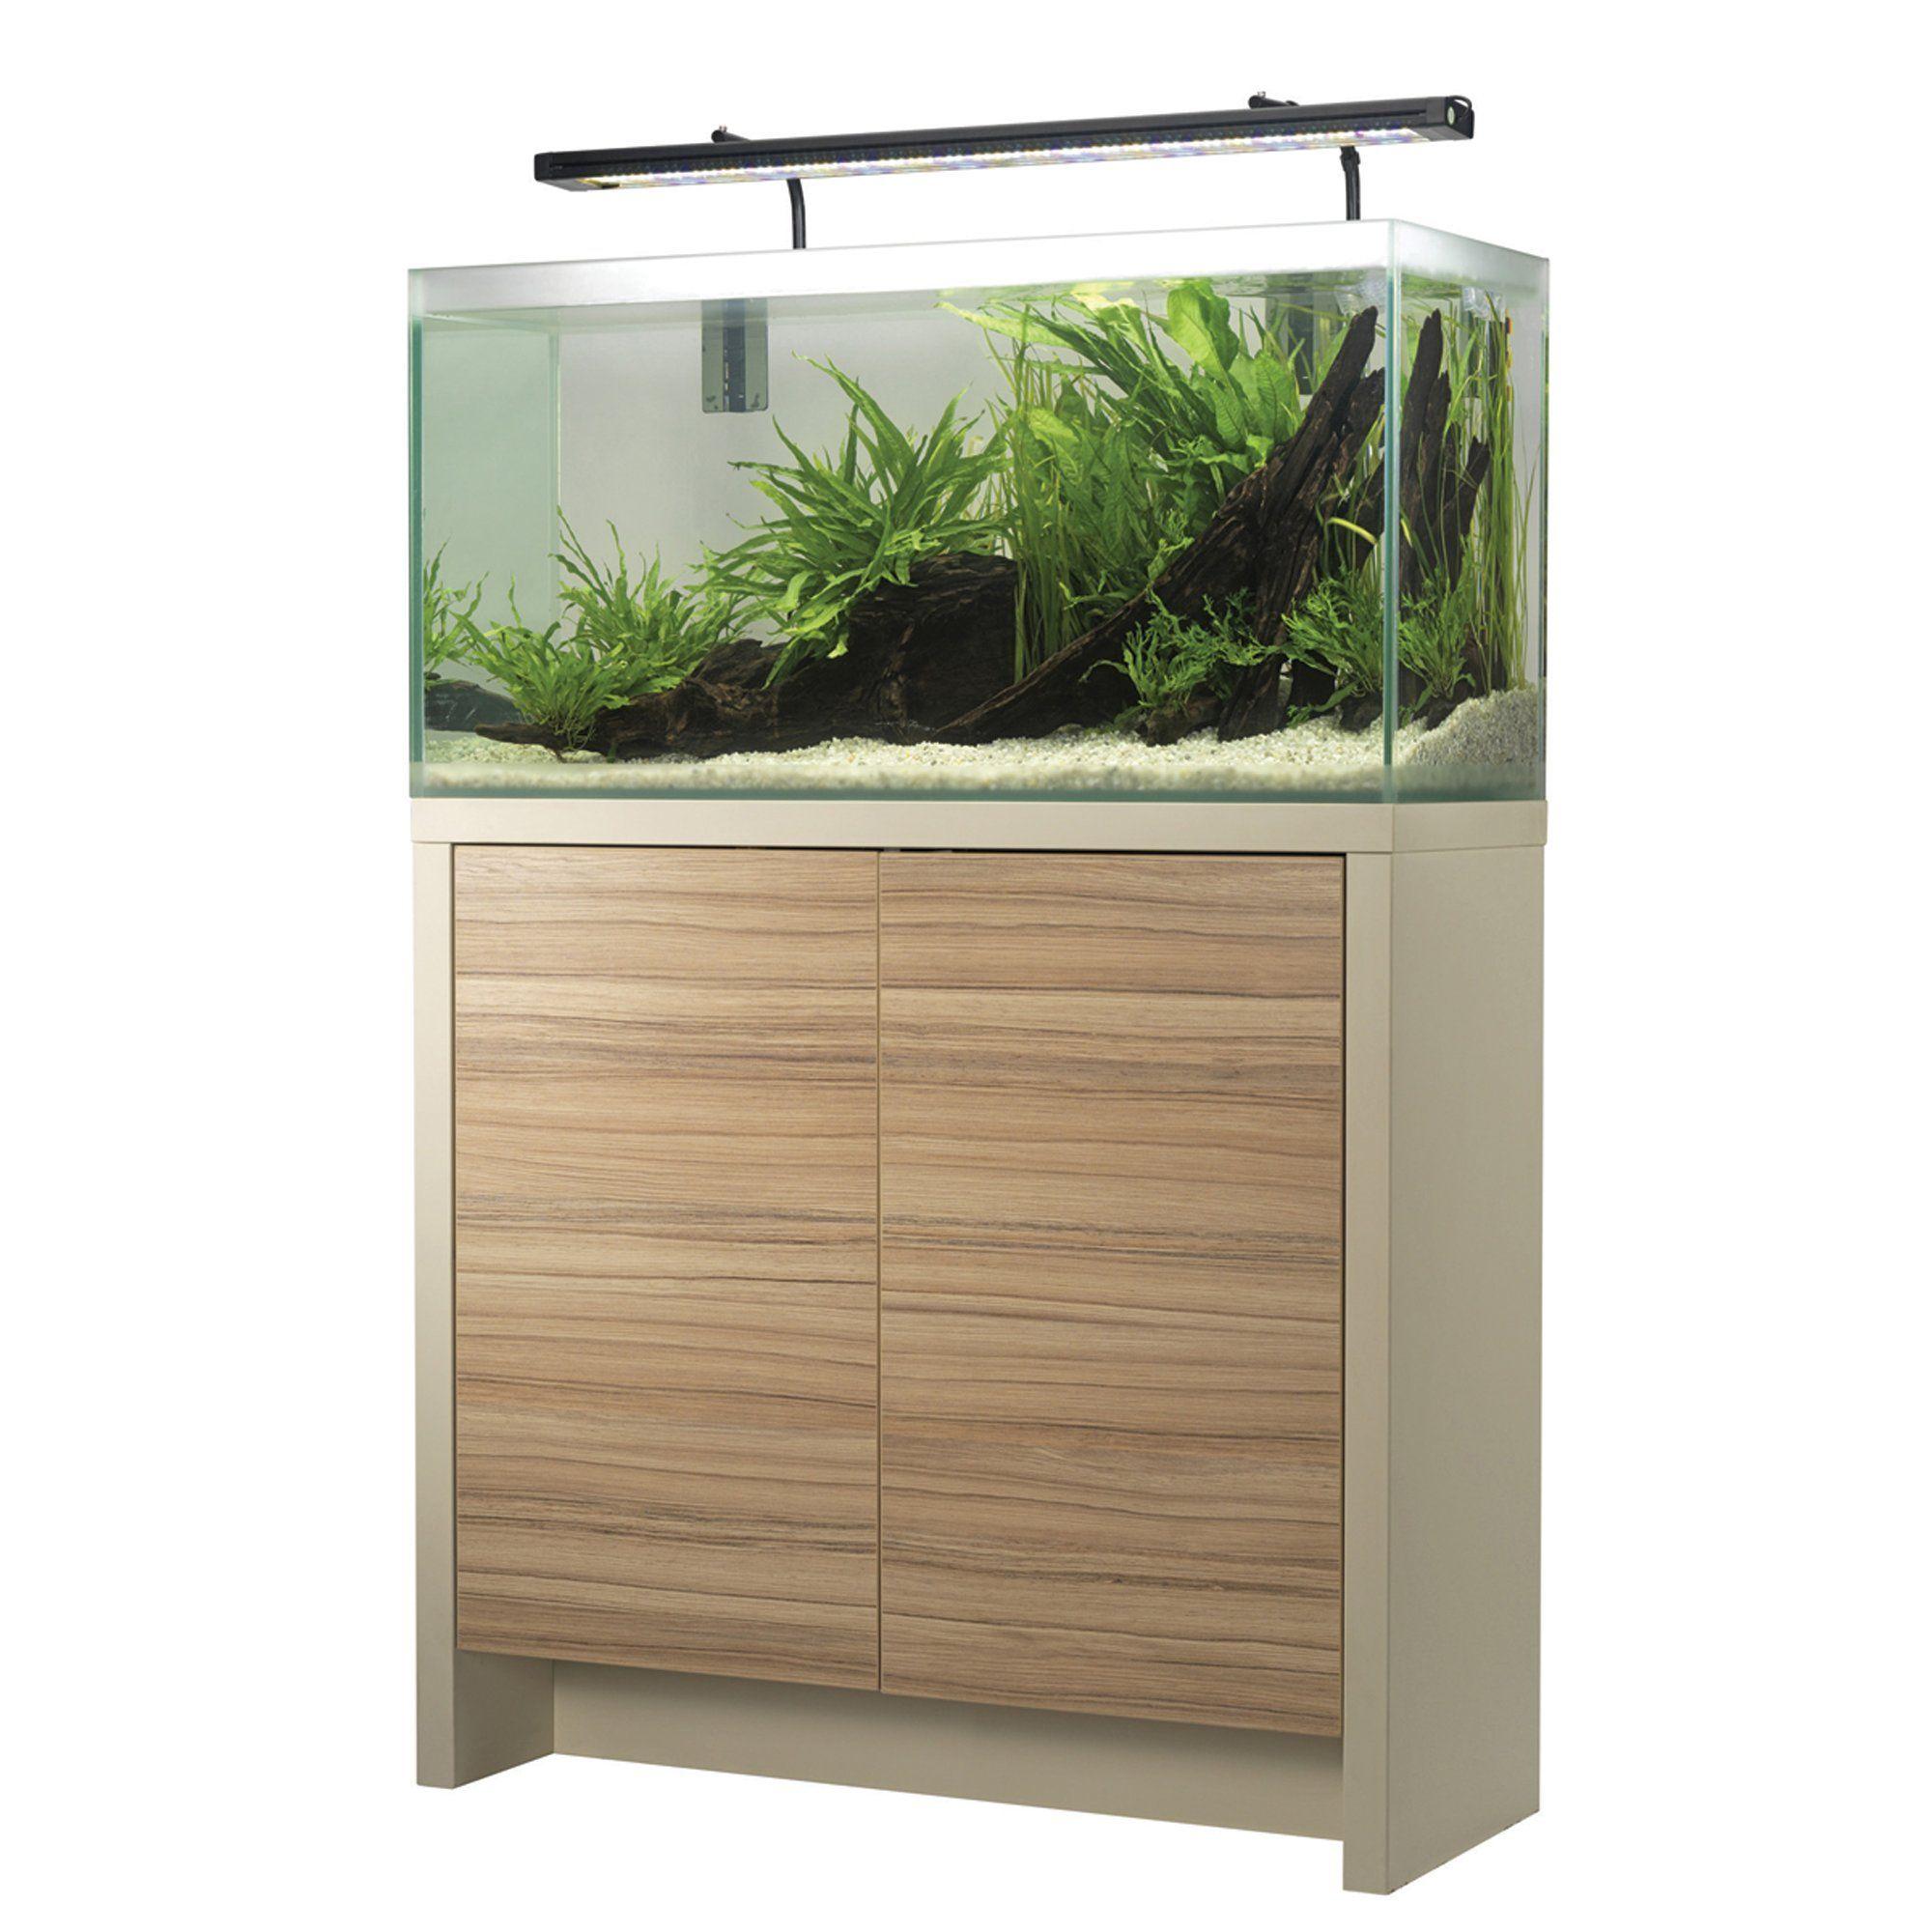 Fluval 34 Gallon Freshwater F90 Aquarium Set Aquarium Cabinet Aquarium Aquarium Set